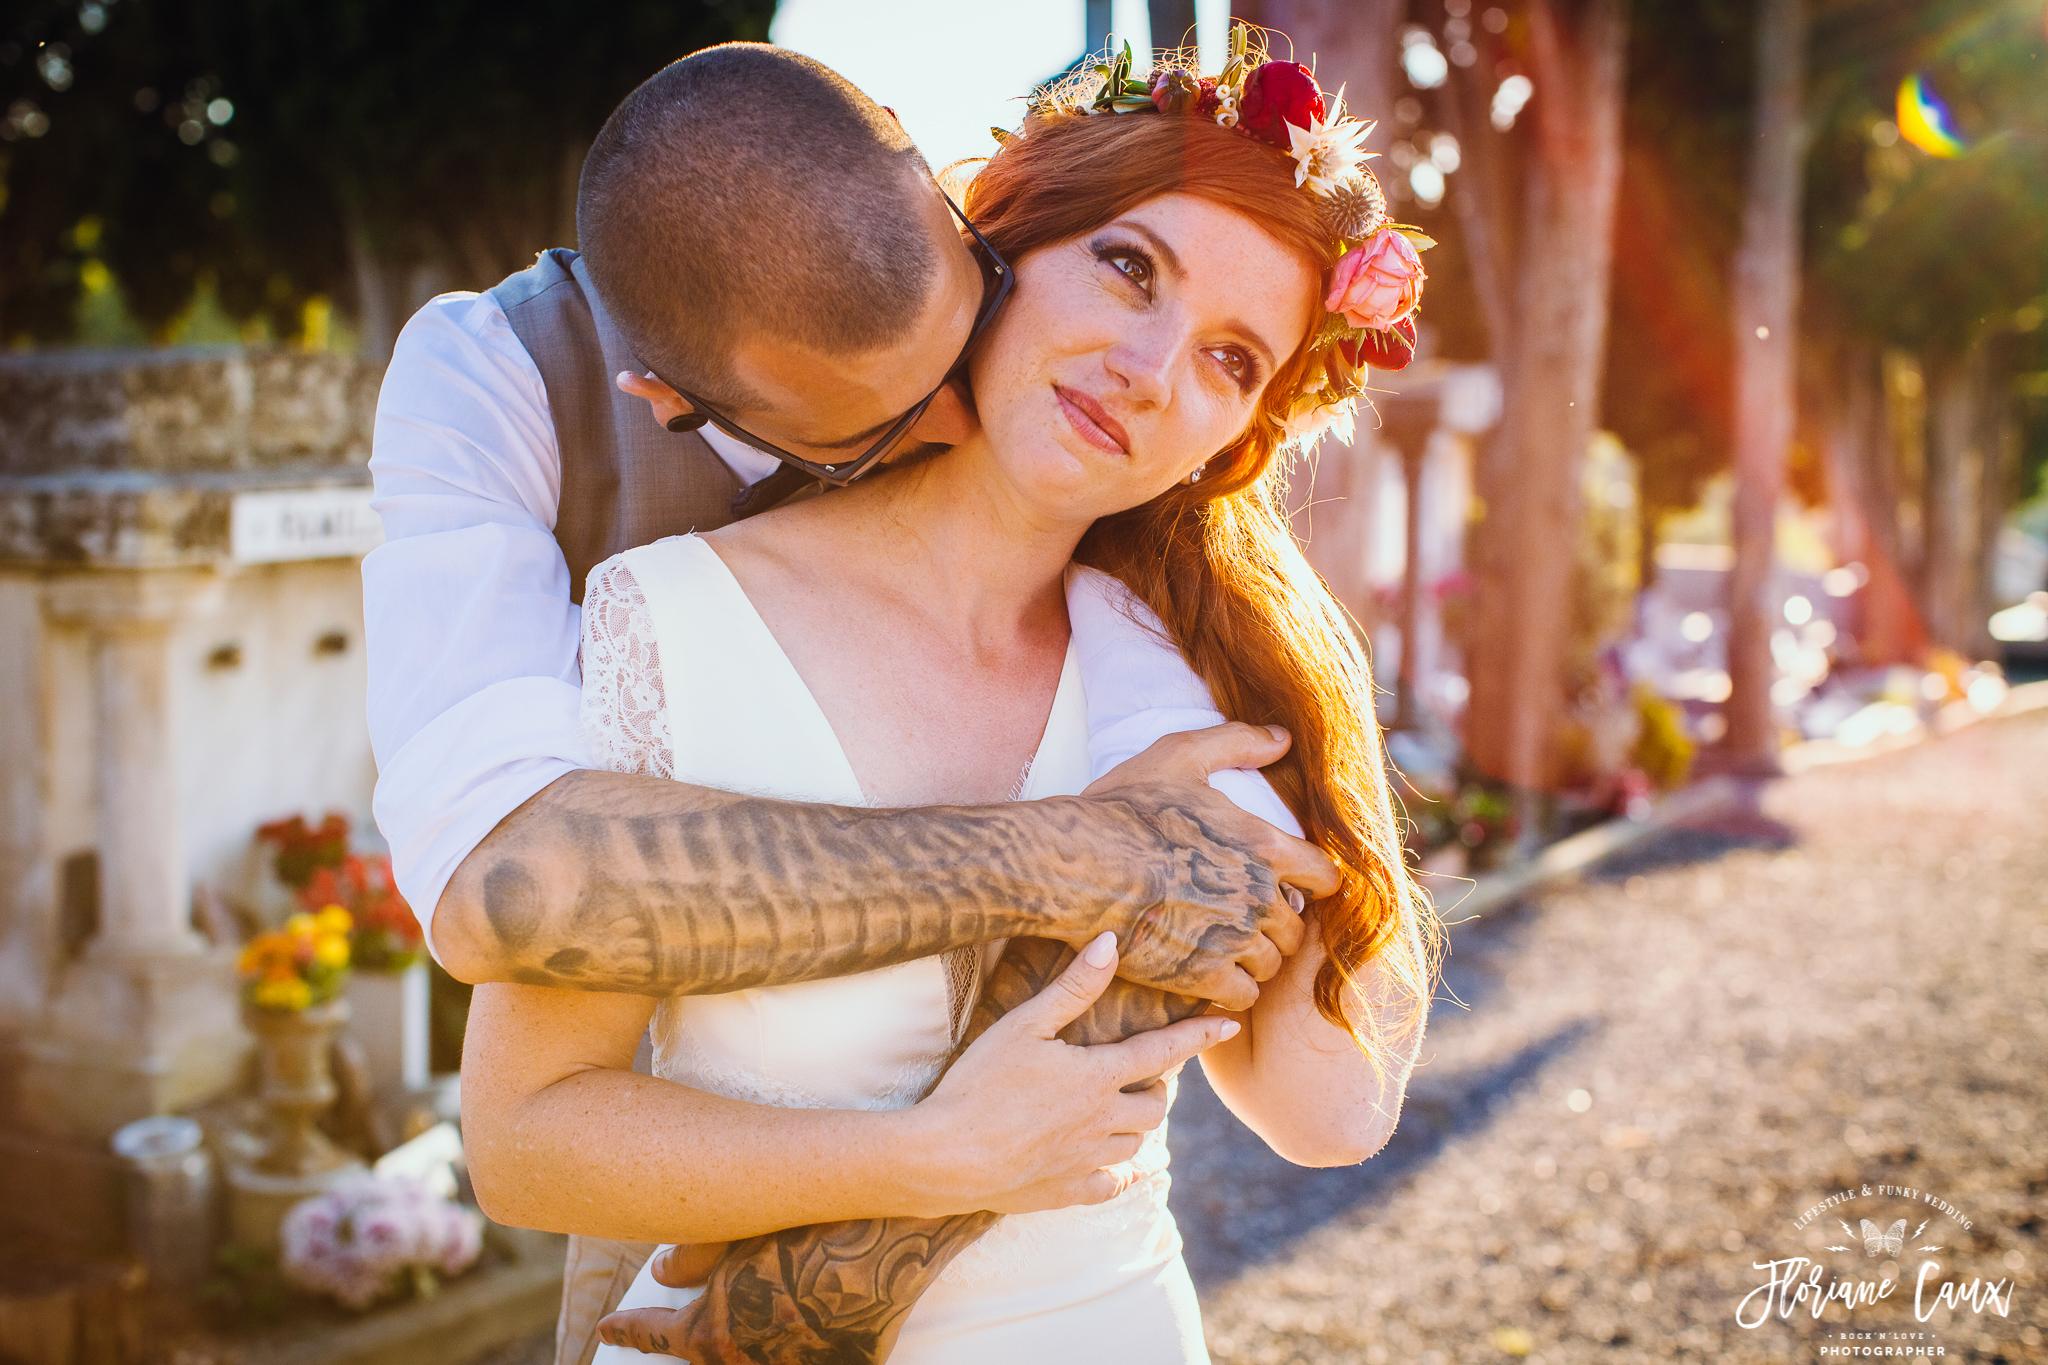 photographe-mariage-toulouse-rocknroll-maries-tatoues-floriane-caux-59